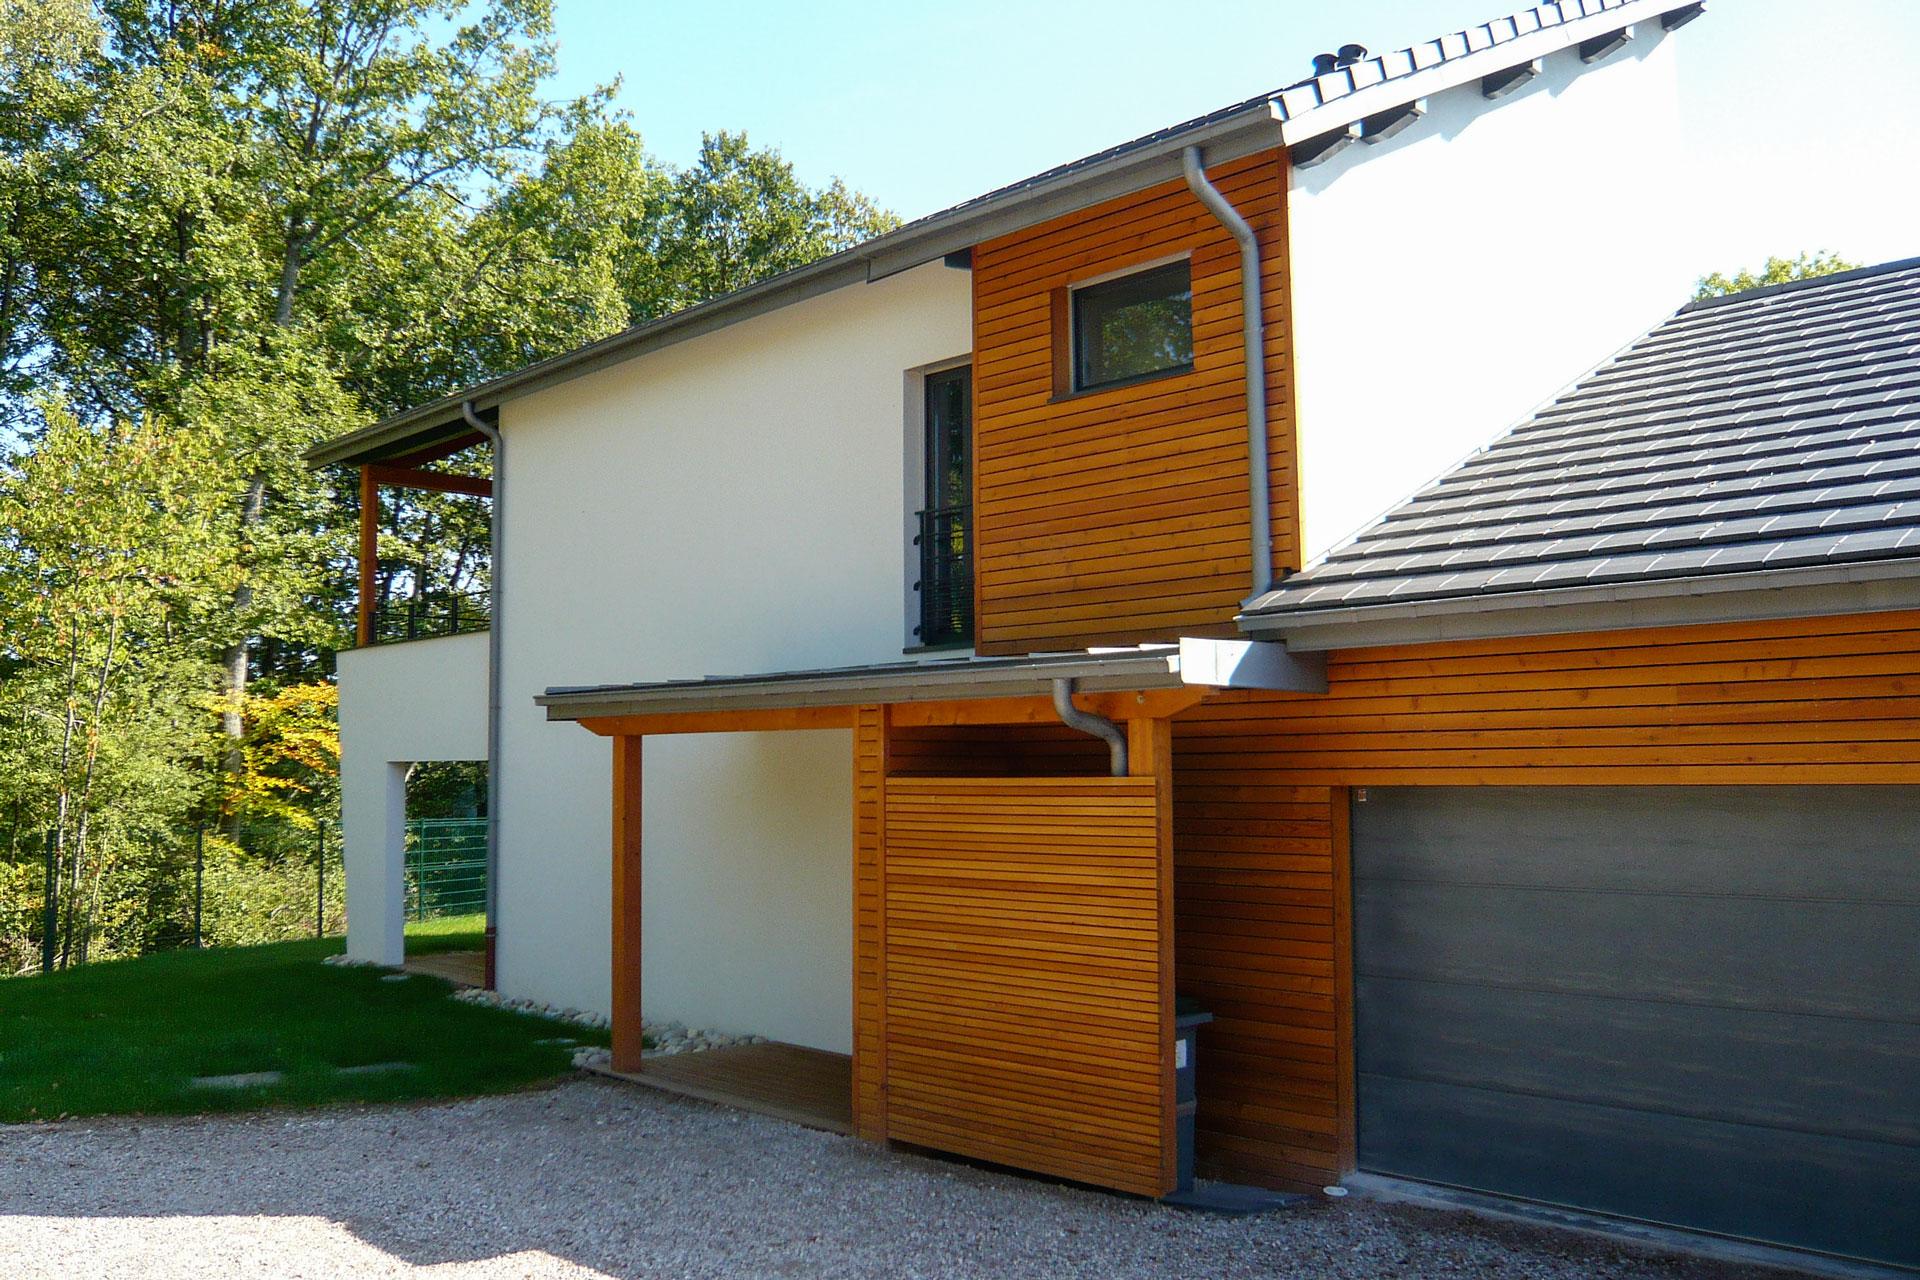 Emejing Maison Moderne En Bois Bbc Gallery - Home Decorating Ideas ...